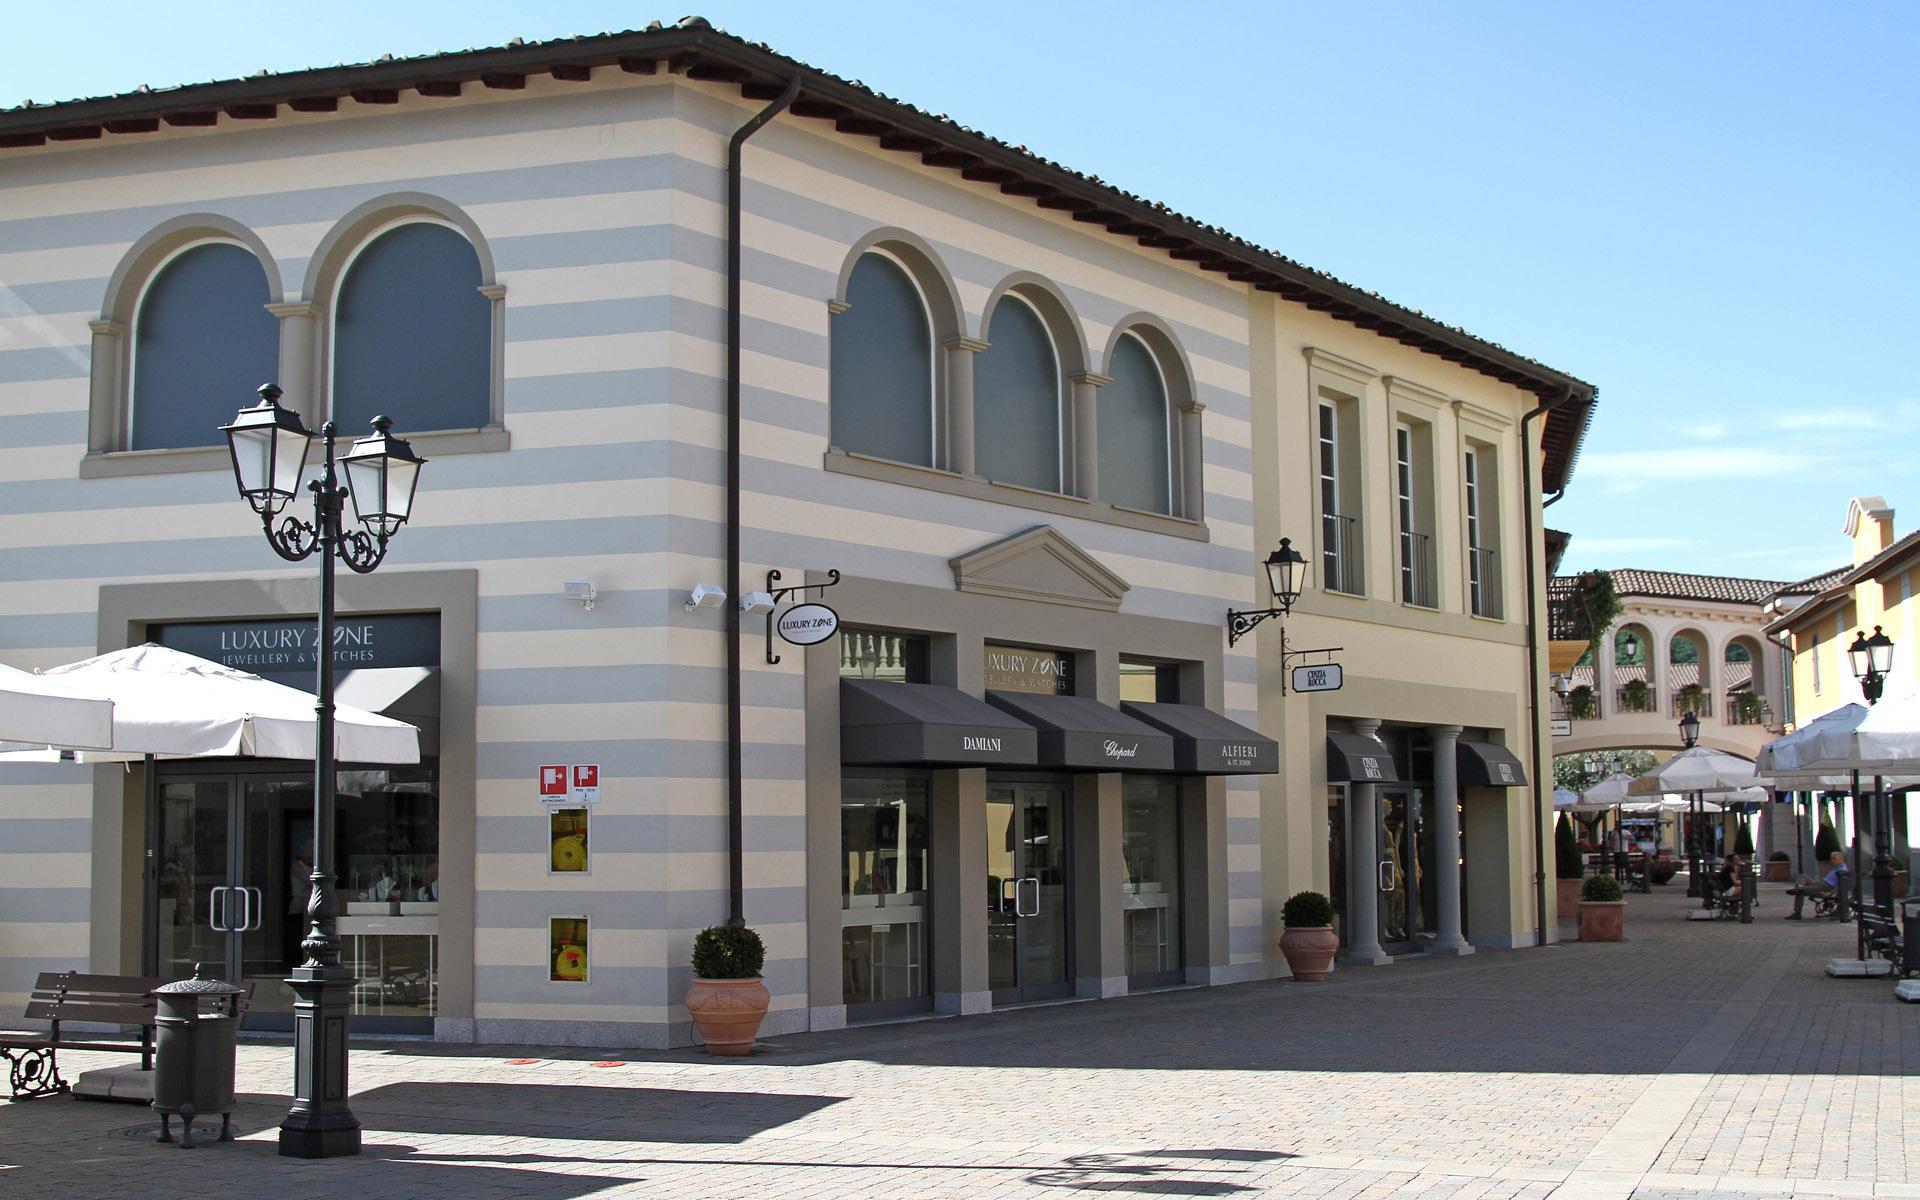 Serravalle designer outlet r p engineering for Serravalle outlet milan